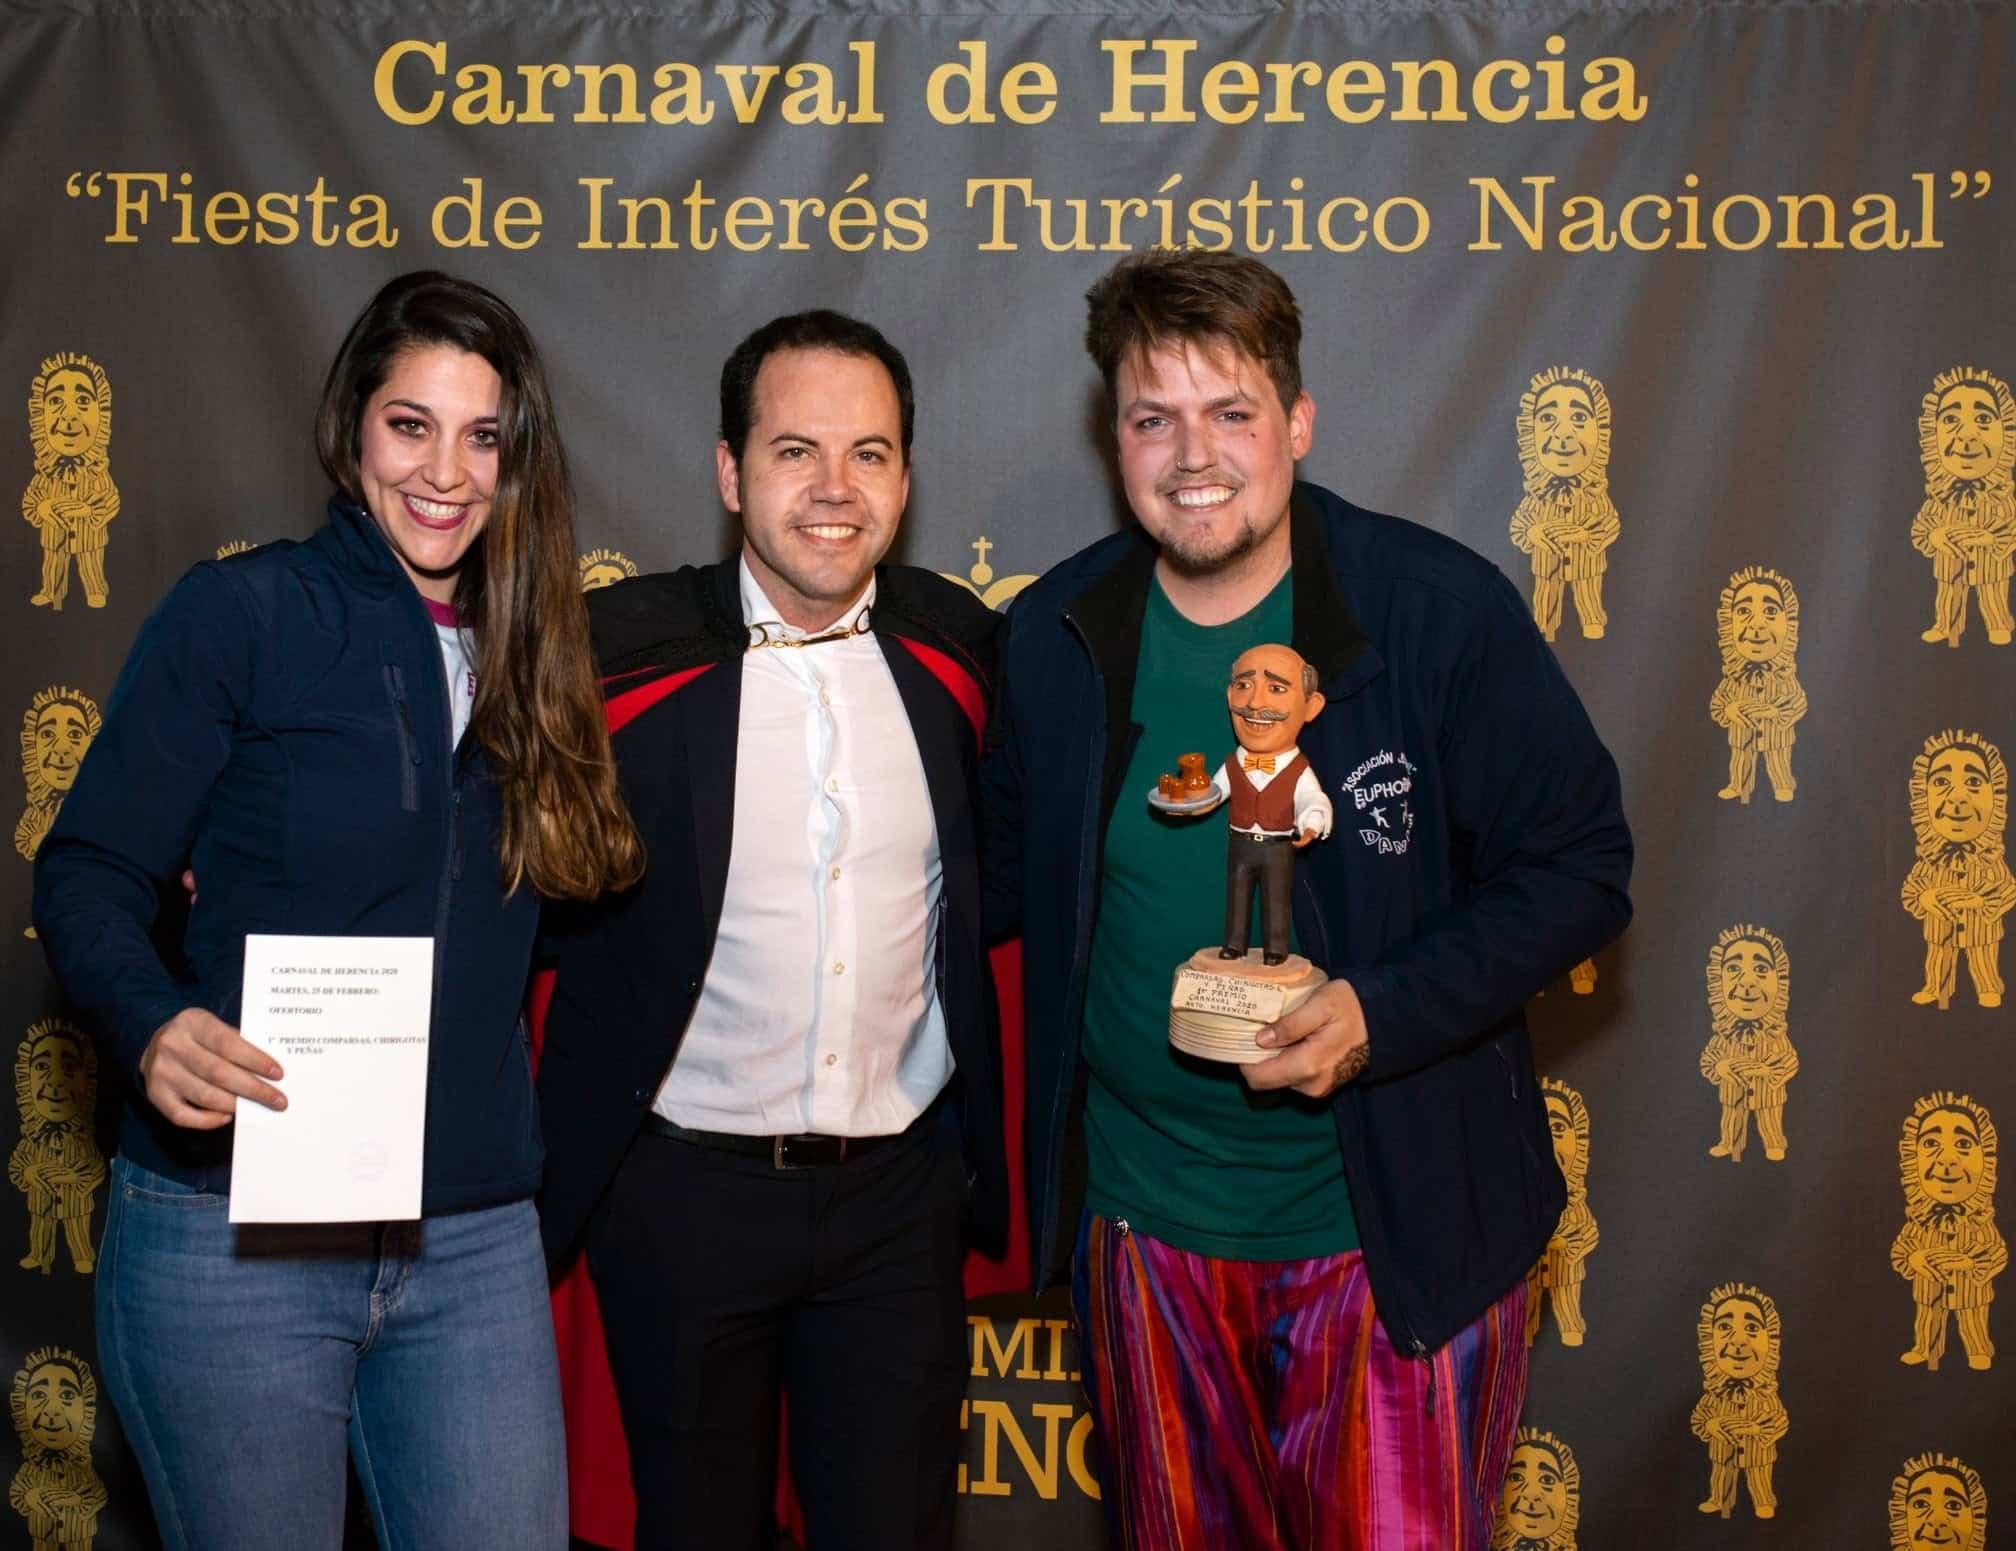 Carnaval de herencia 2020 ofertorio 116 - Selección de fotografías del Ofertorio del Carnaval de Herencia